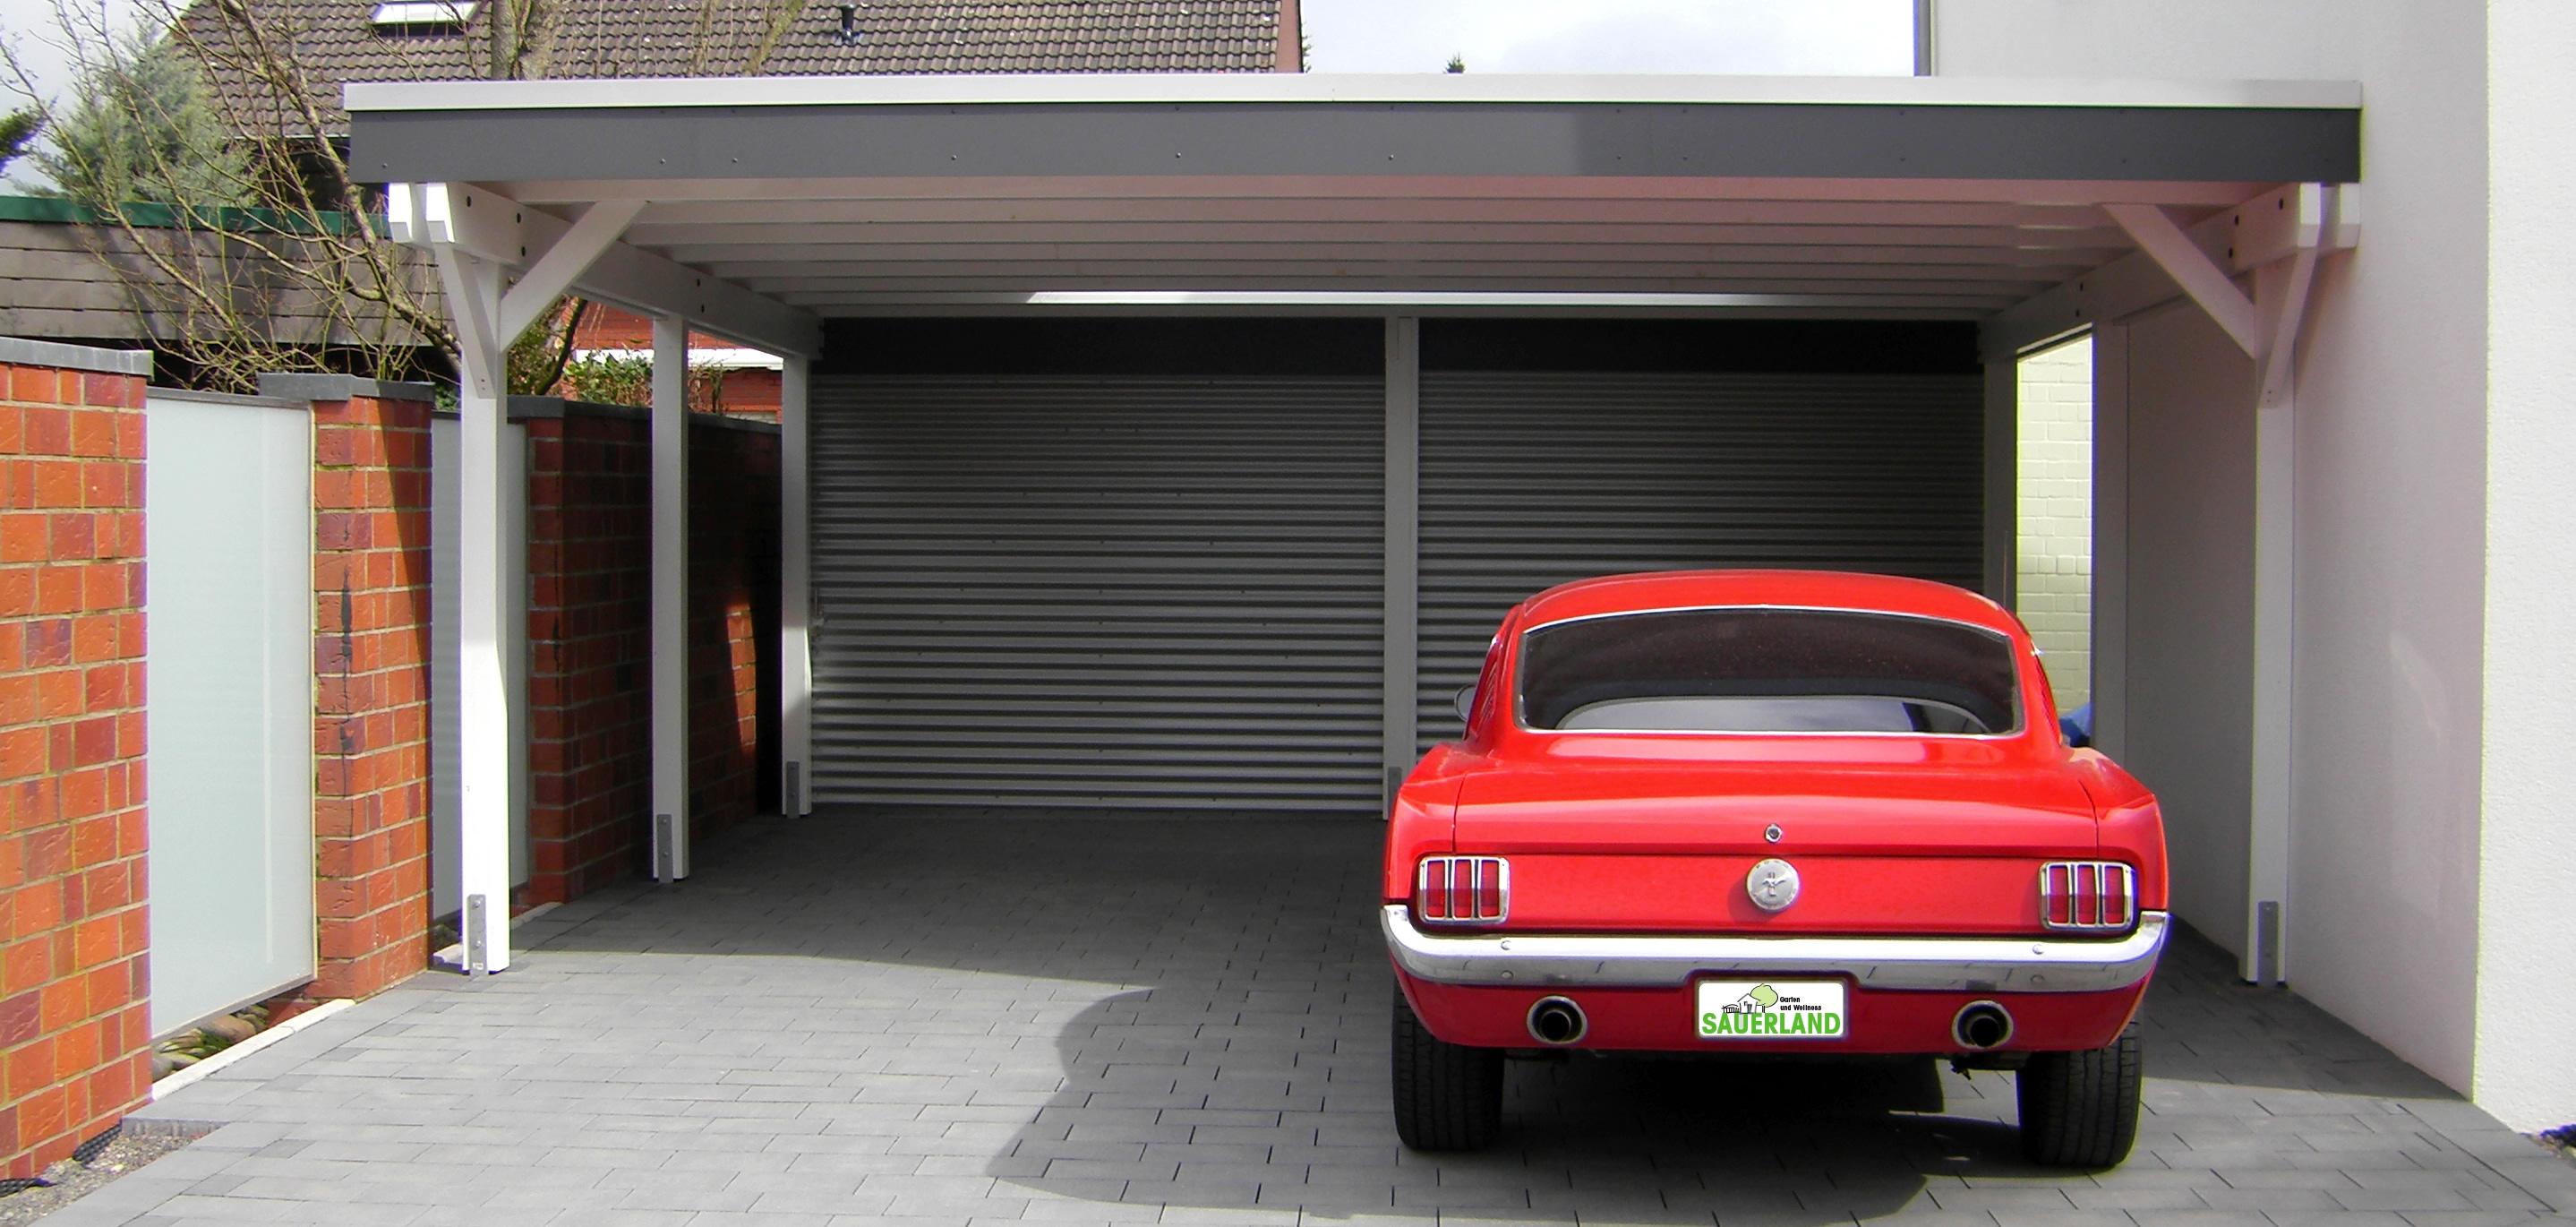 Mustang in Carport